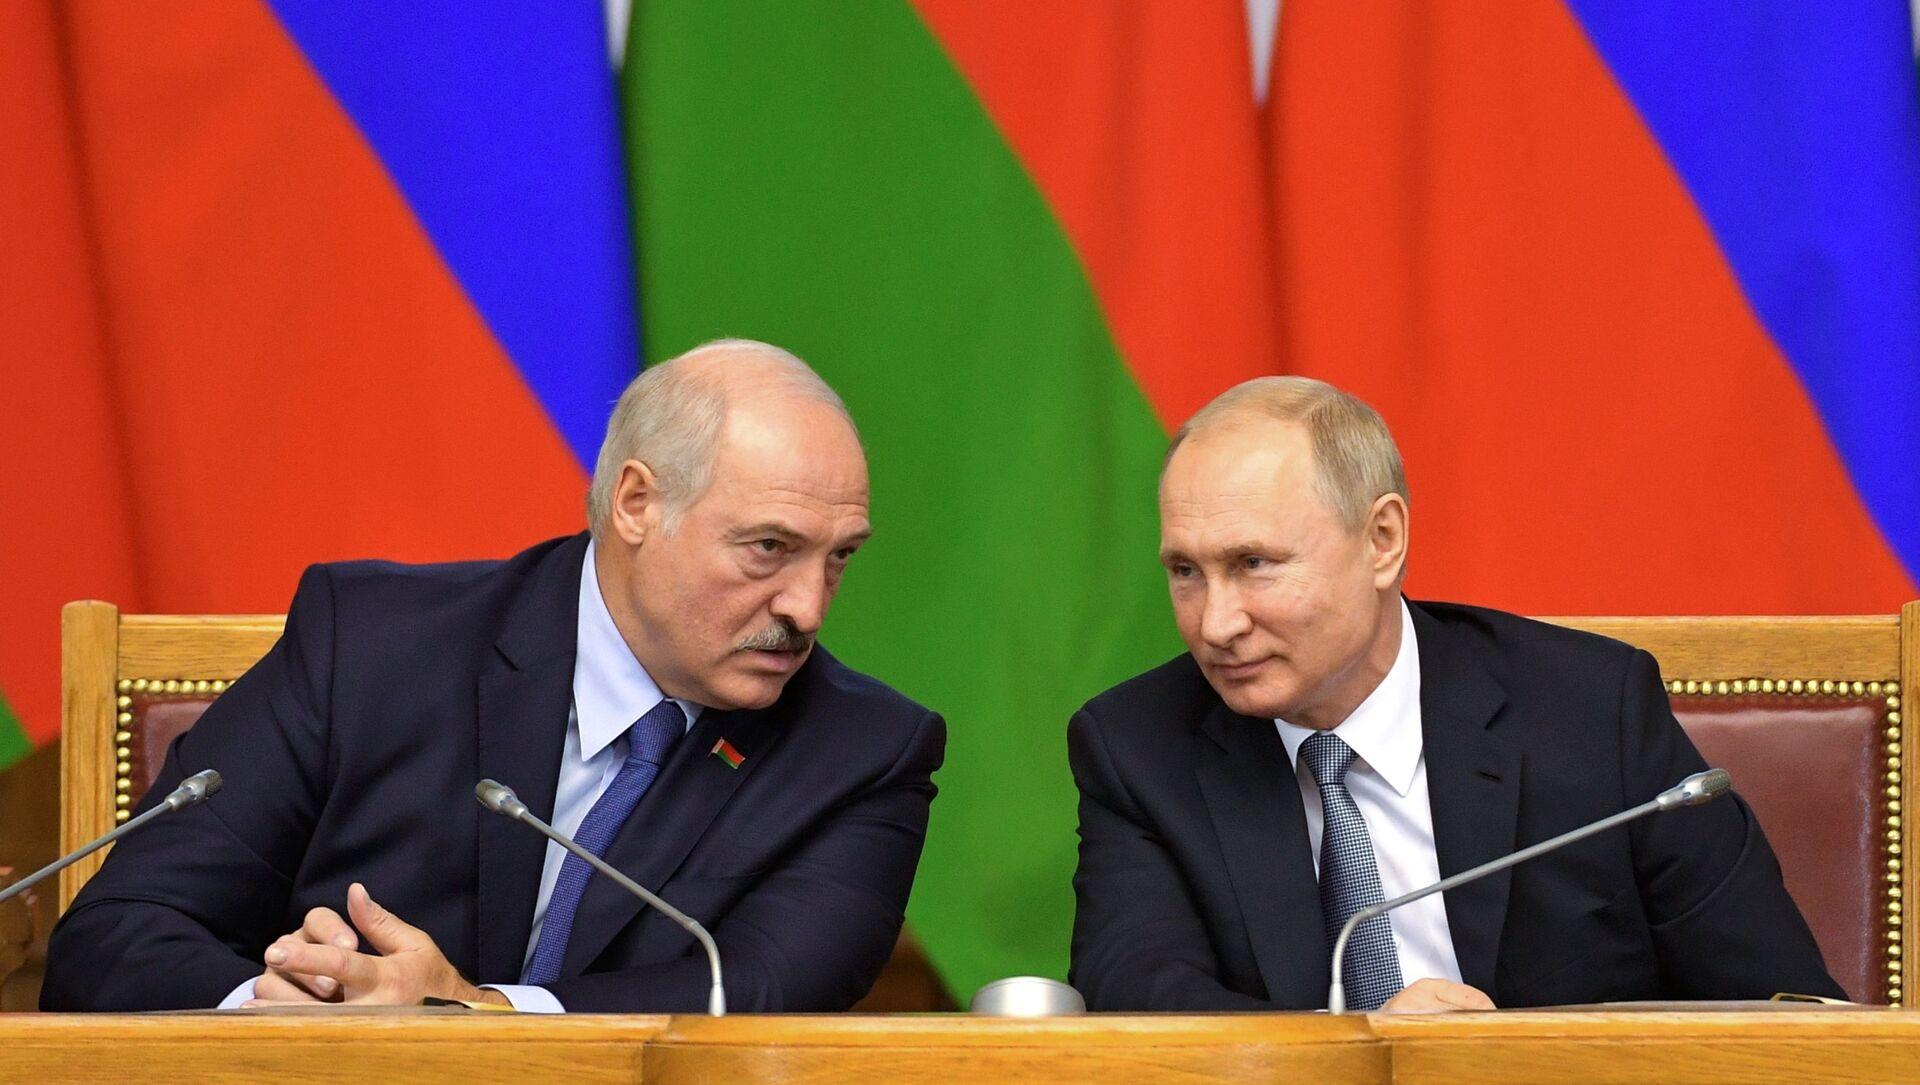 El presidente de Bielorrusia, Alexandr Lukashenko, y el presidente de Rusia, Vladímir Putin - Sputnik Mundo, 1920, 06.11.2019